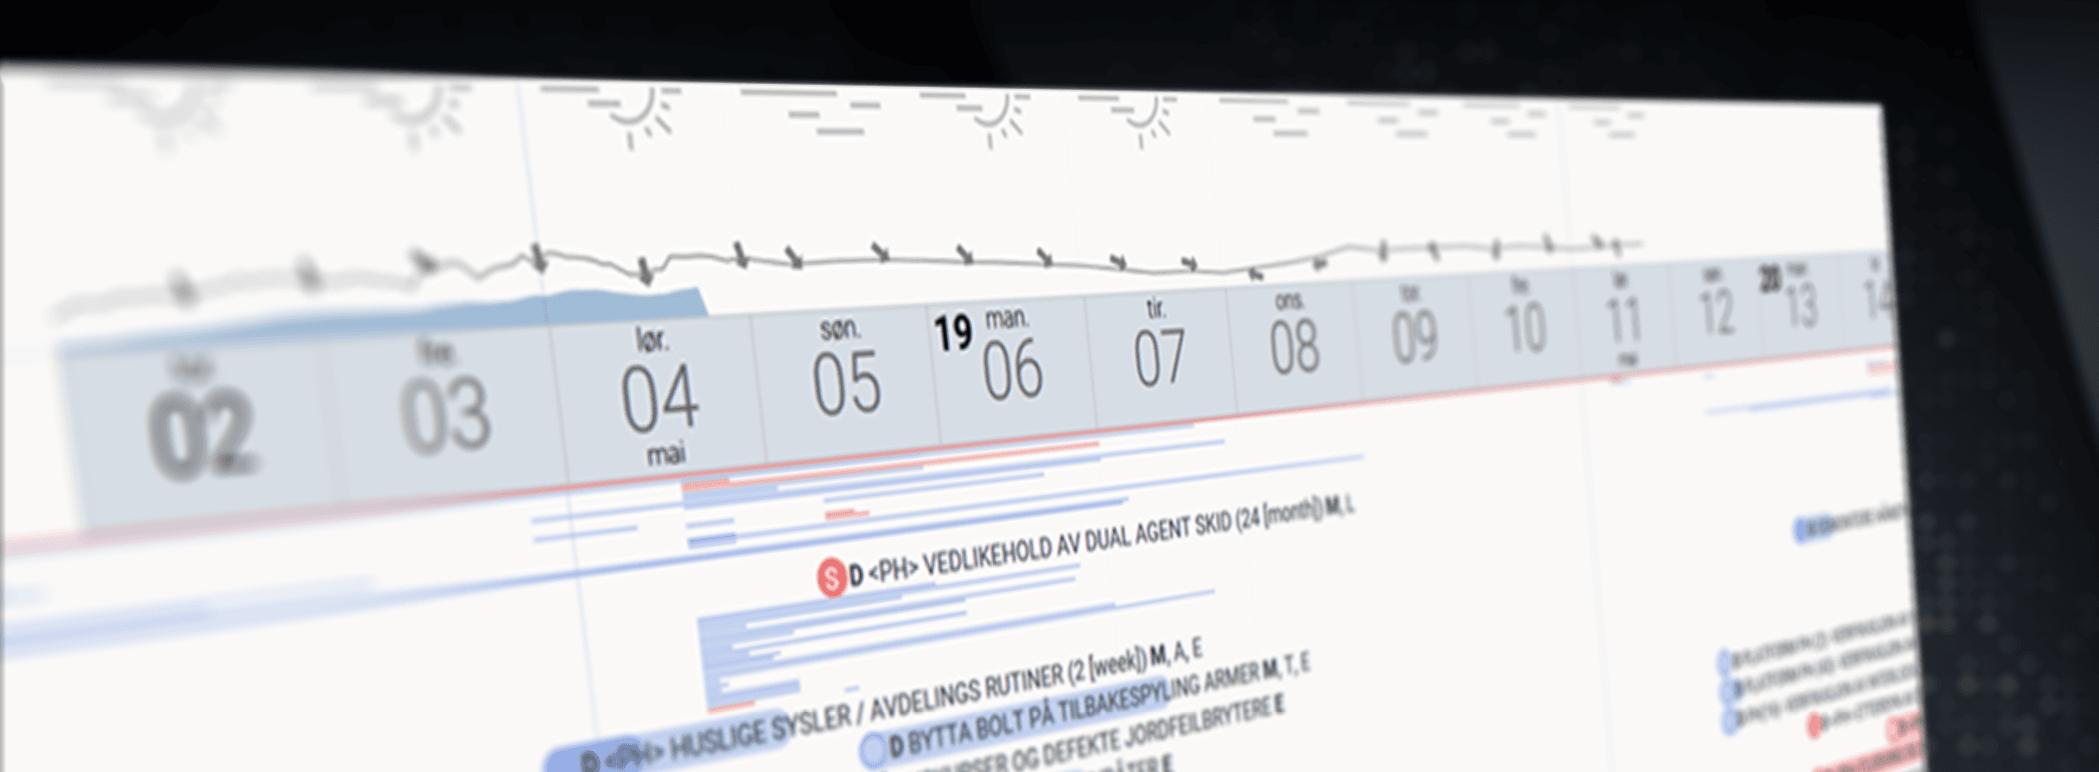 Aker BP streamlines planning with LivePlan